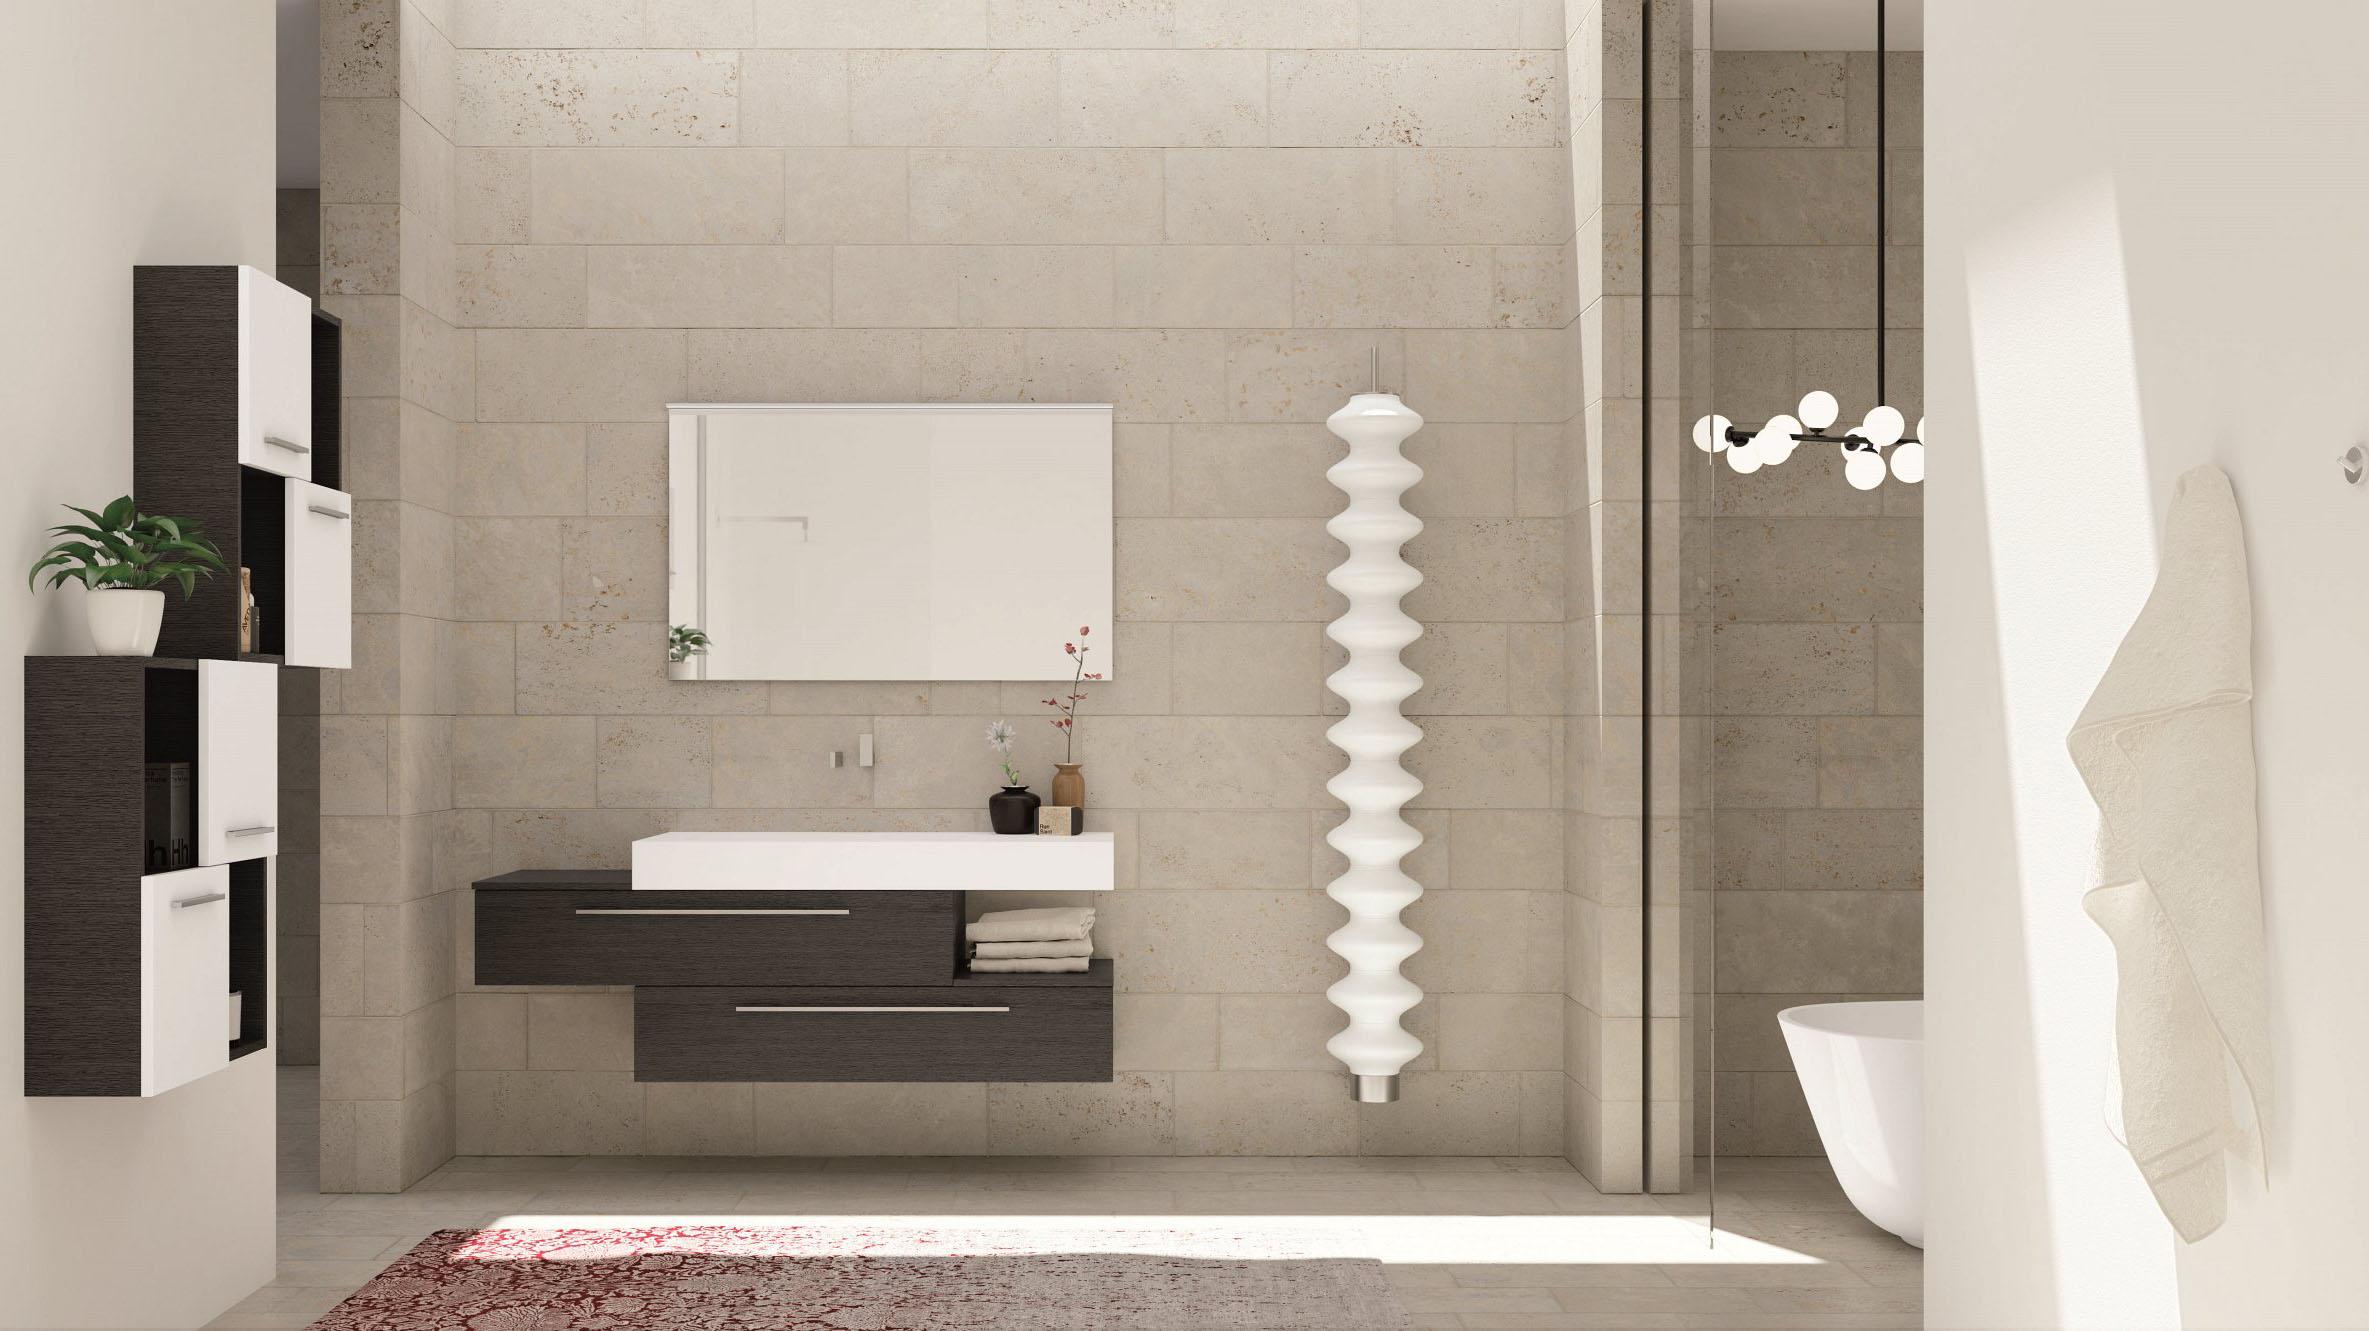 ola l 509 individual waschplatz l sung mein bad direkt. Black Bedroom Furniture Sets. Home Design Ideas